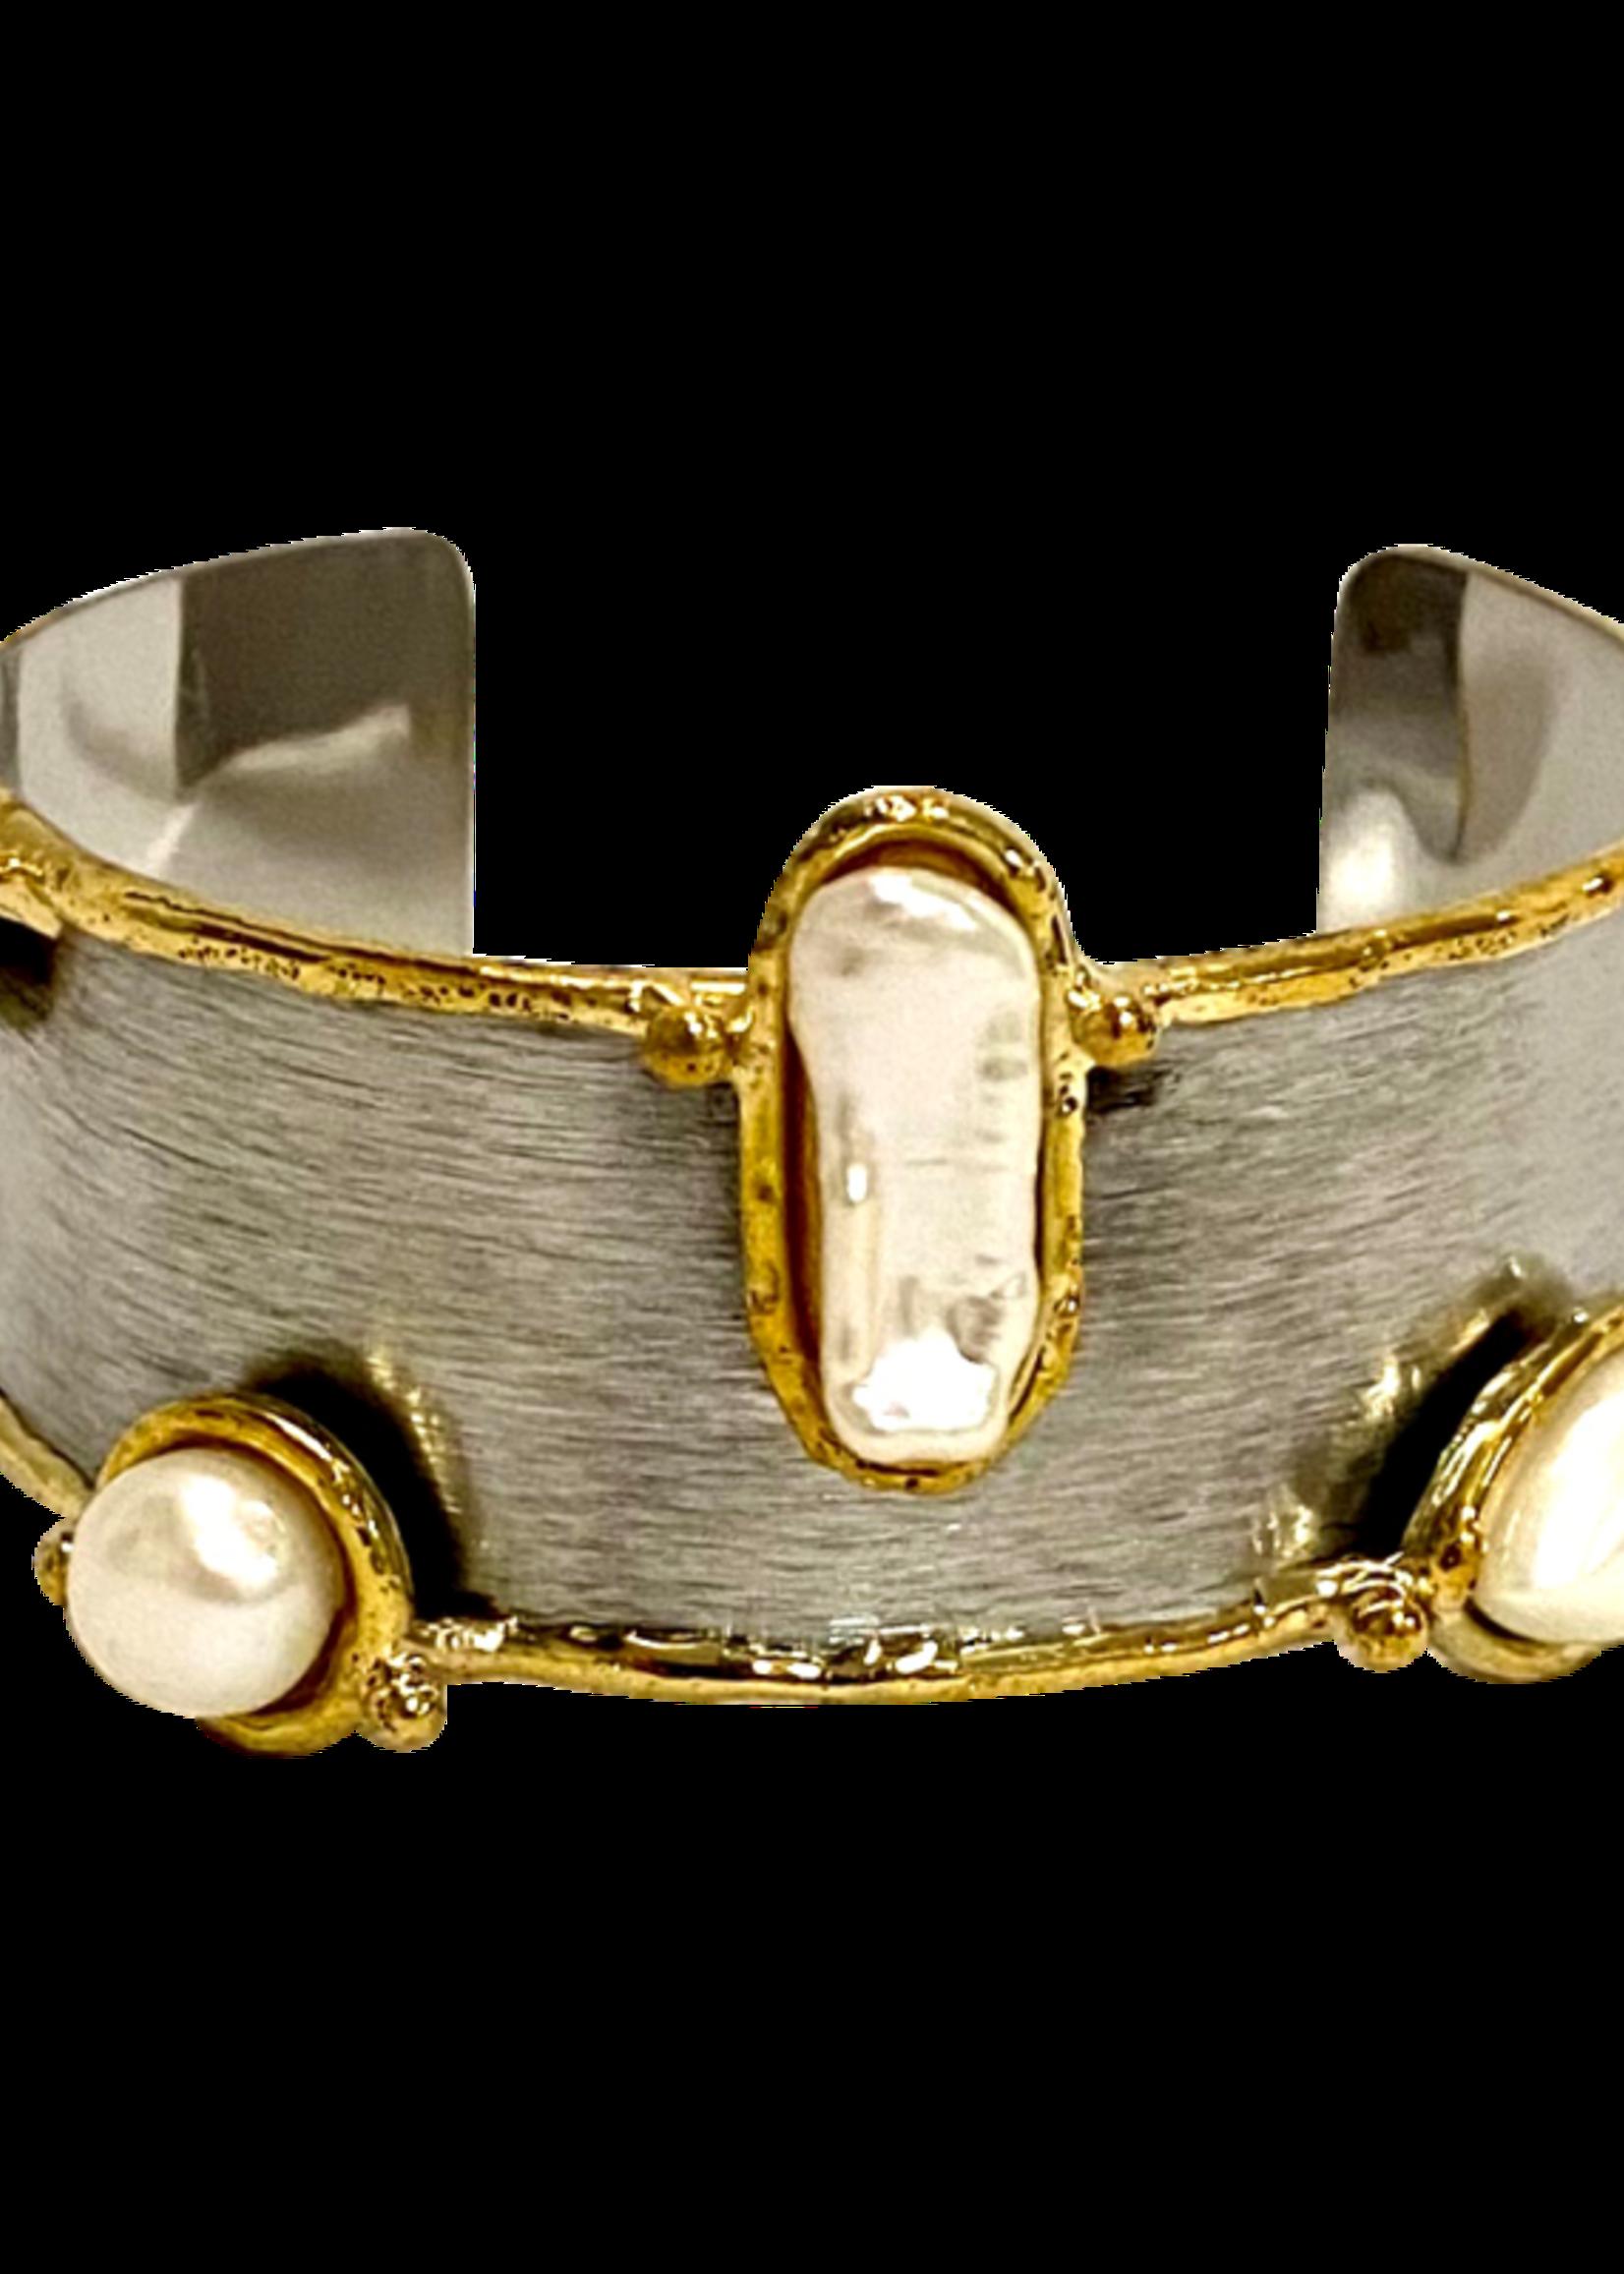 David Jeffery Brushed Stainless Cuffs w/ Pearls